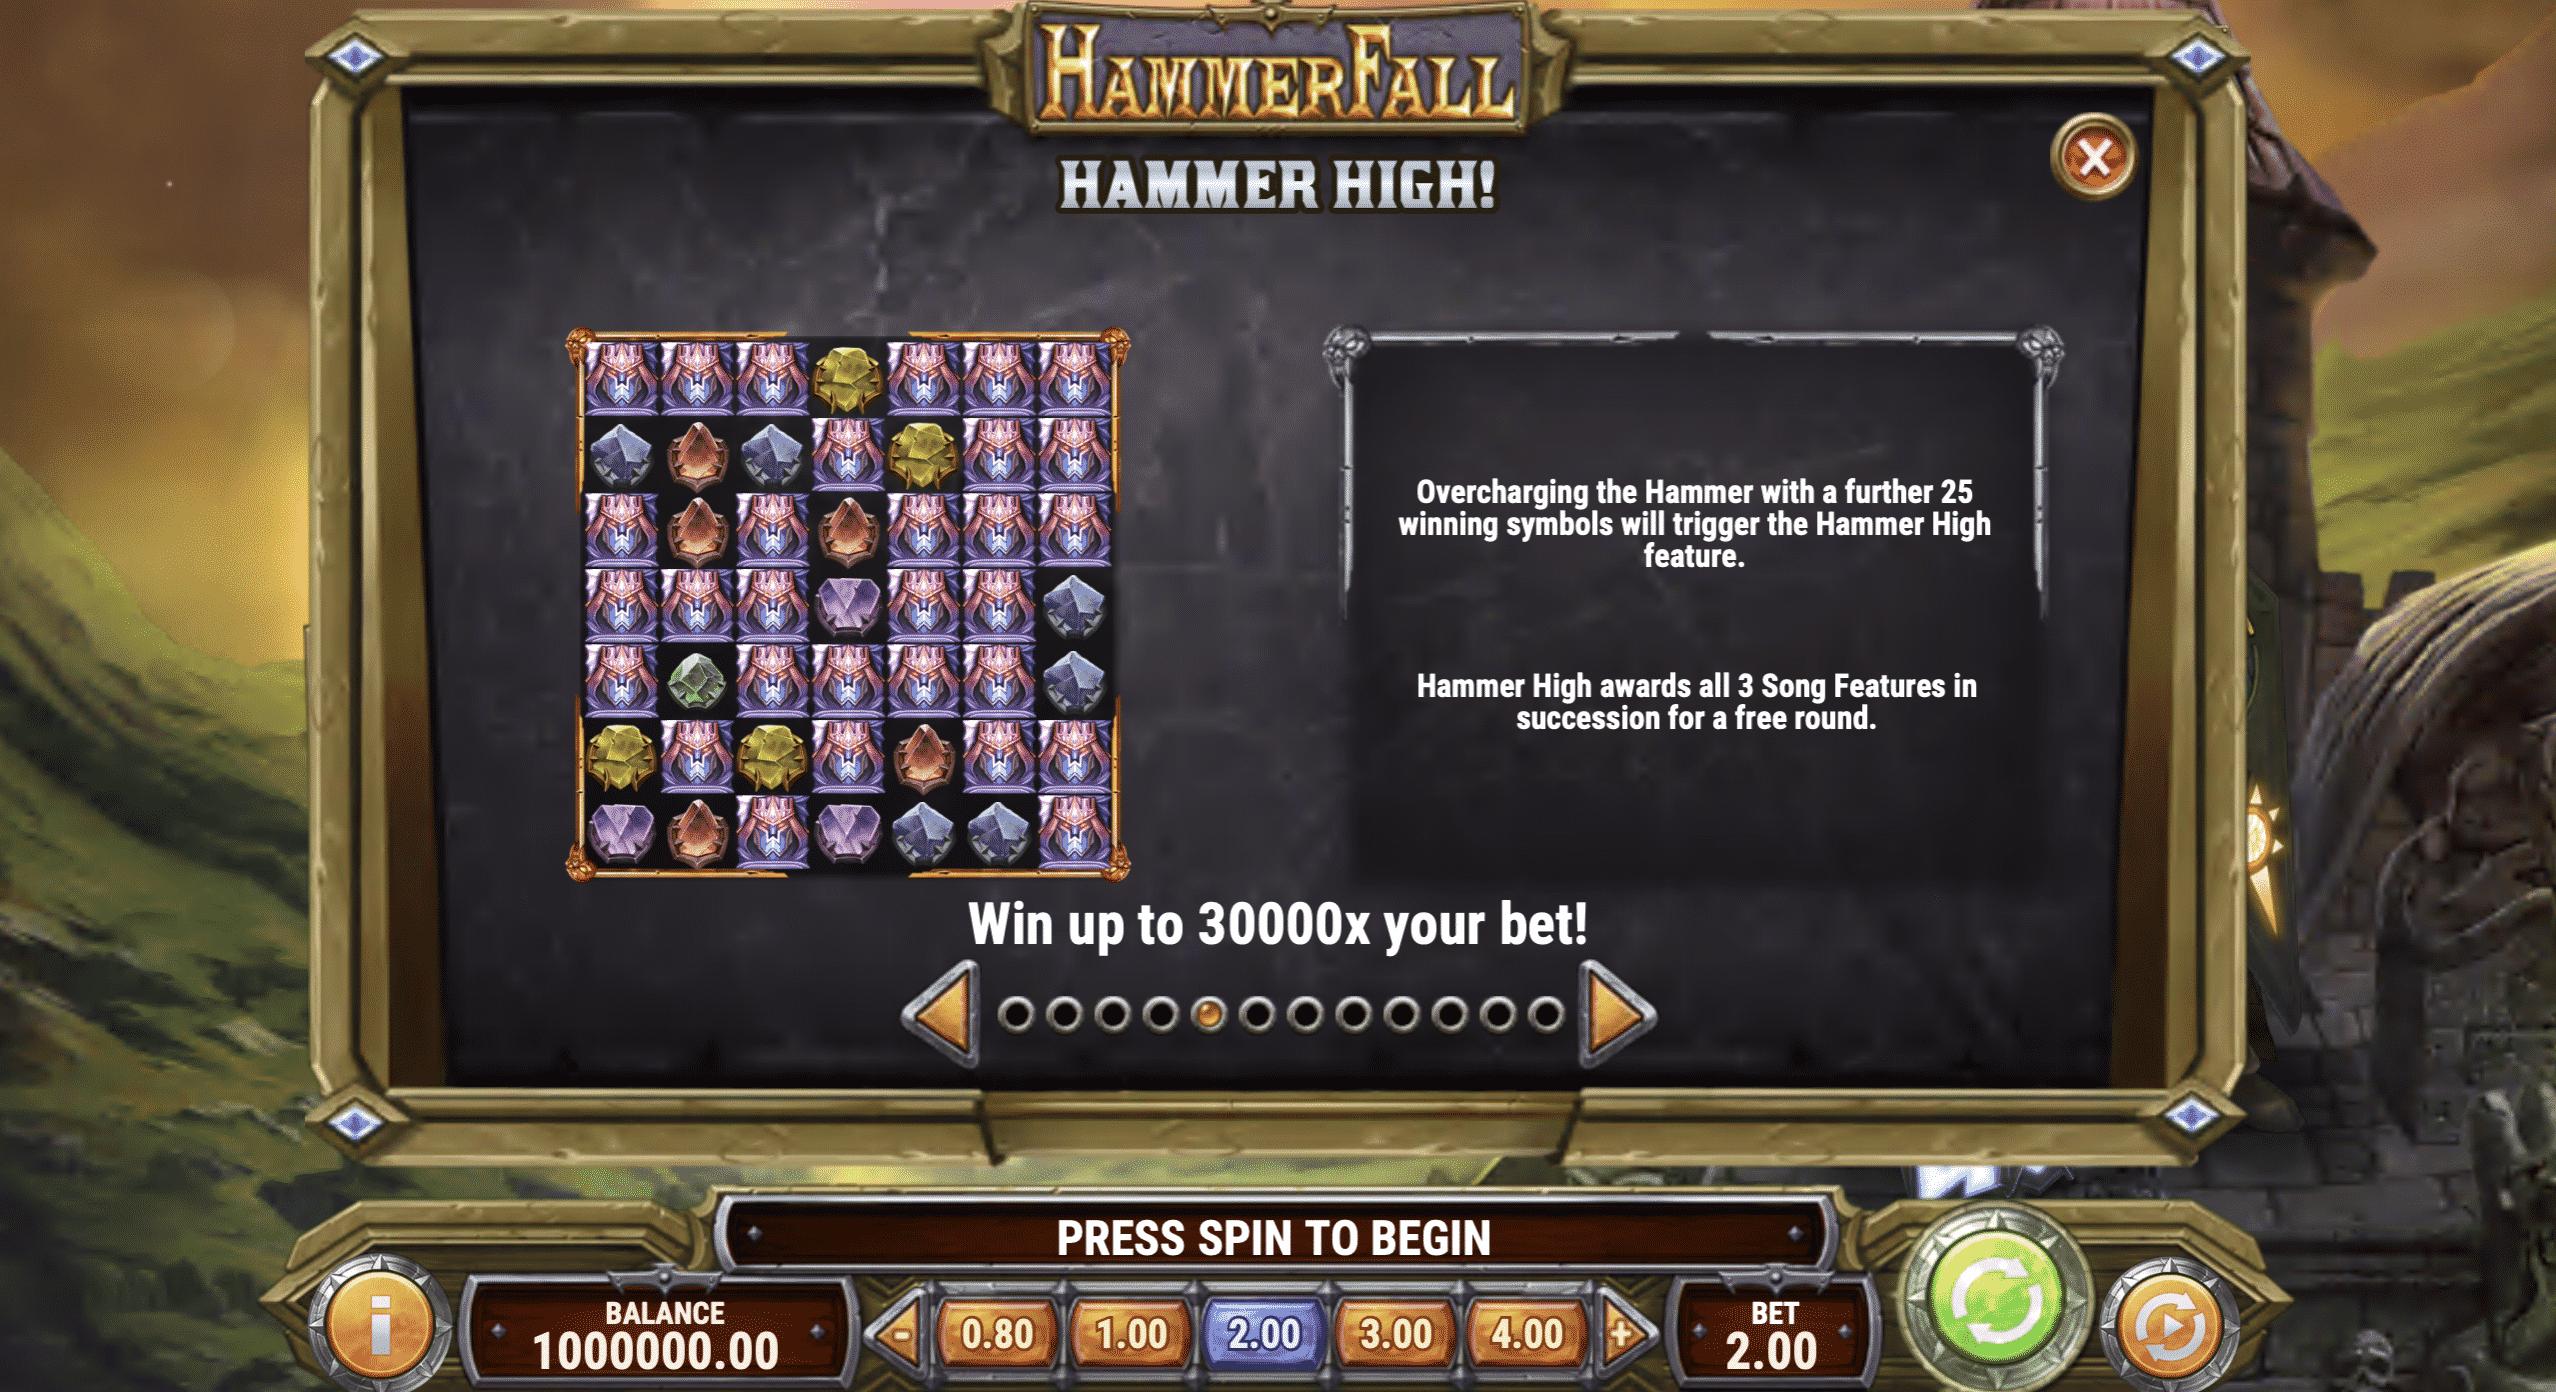 HammerFall Bonus